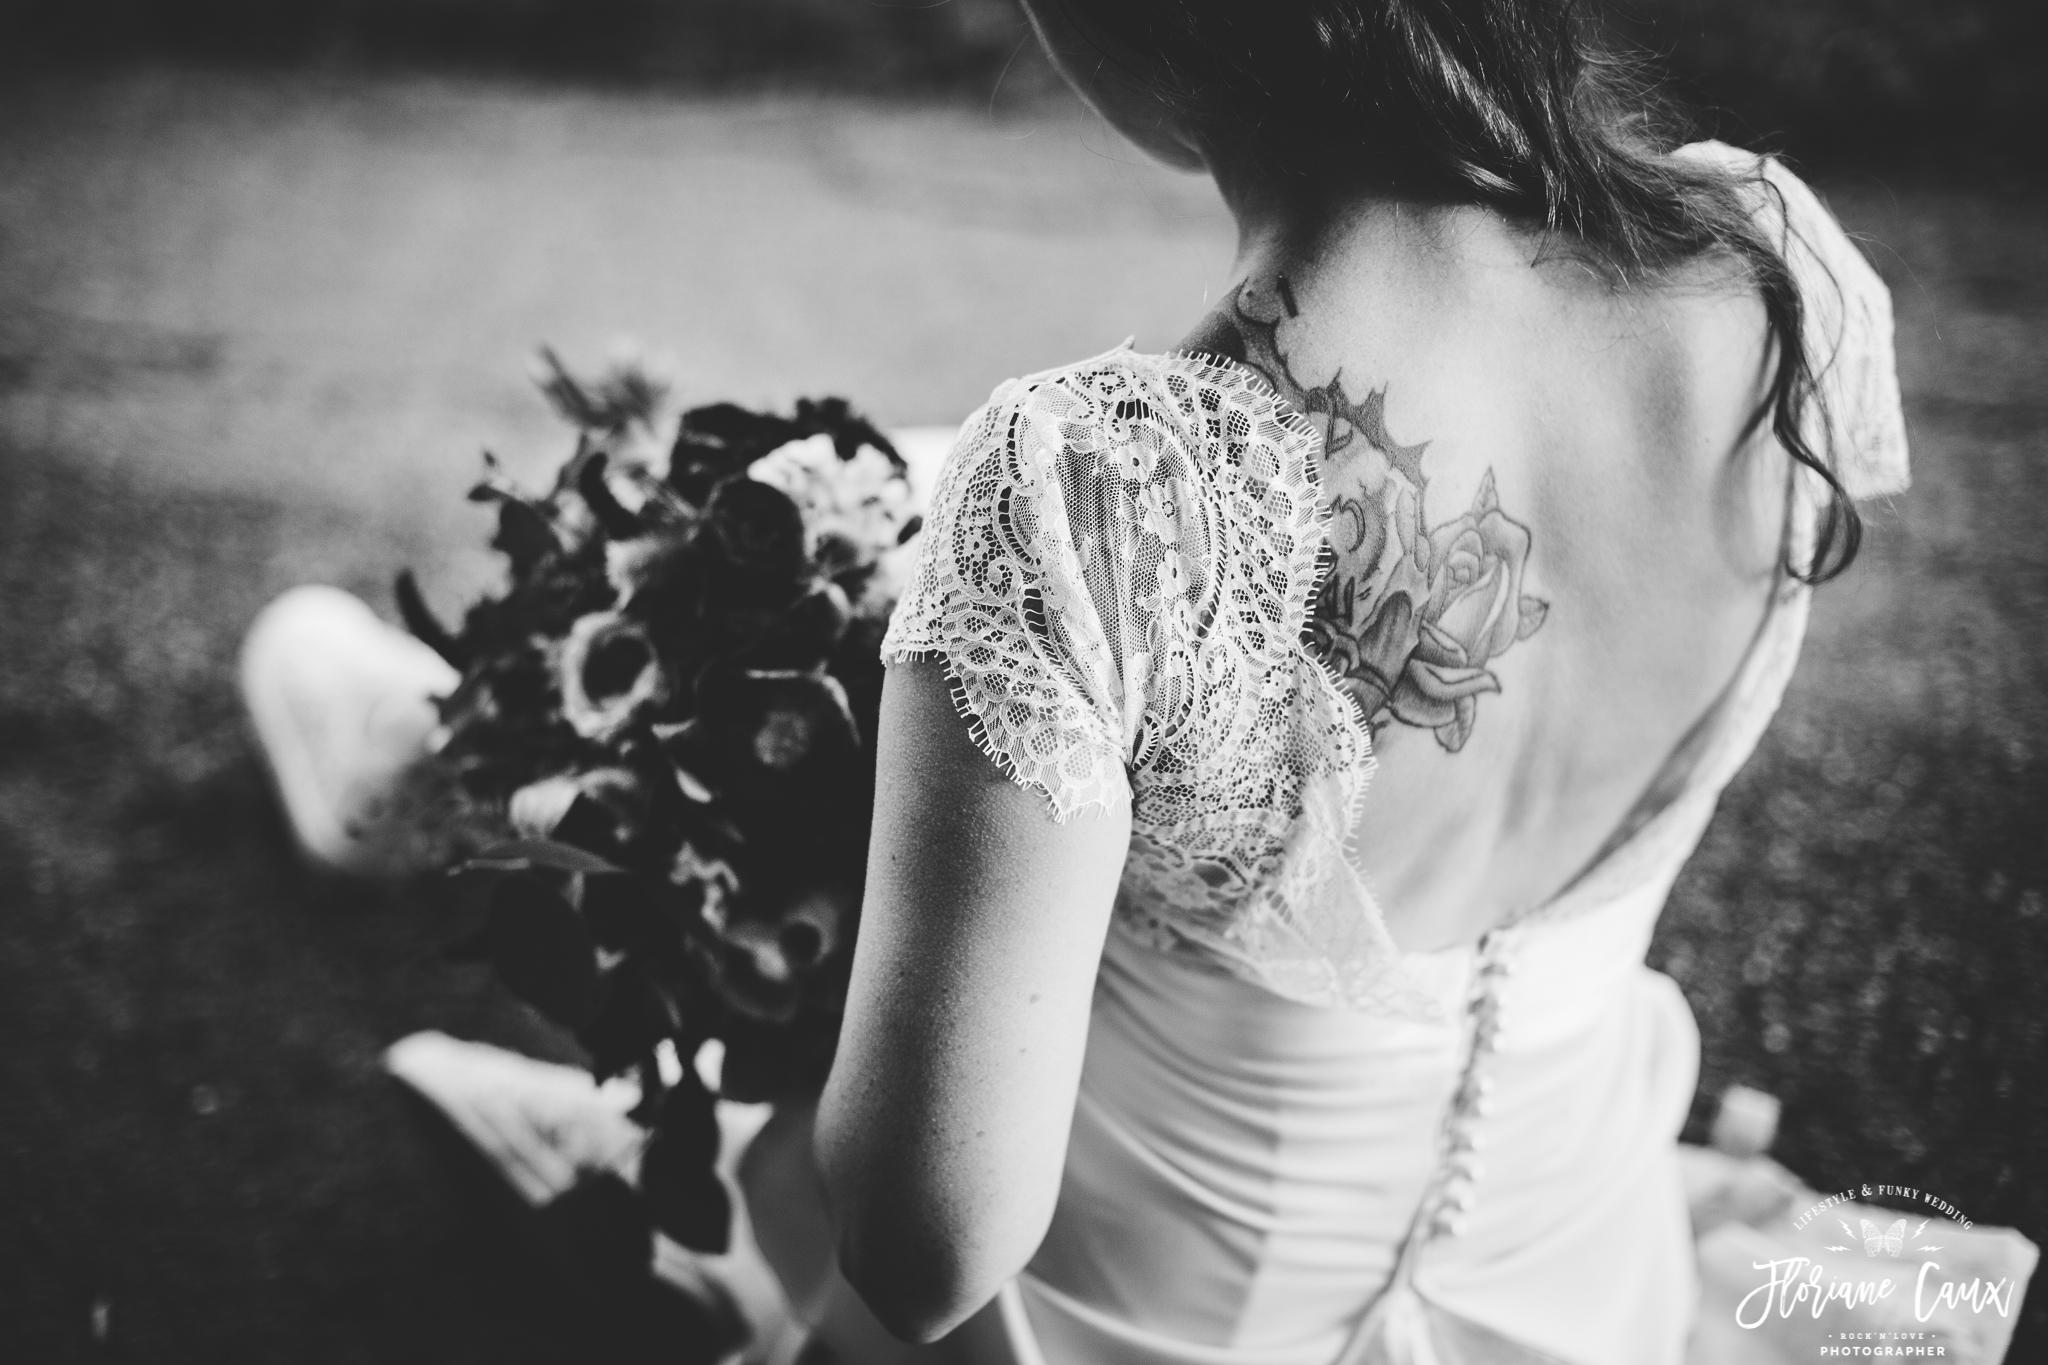 photographe-mariage-toulouse-rocknroll-maries-tatoues-floriane-caux-74